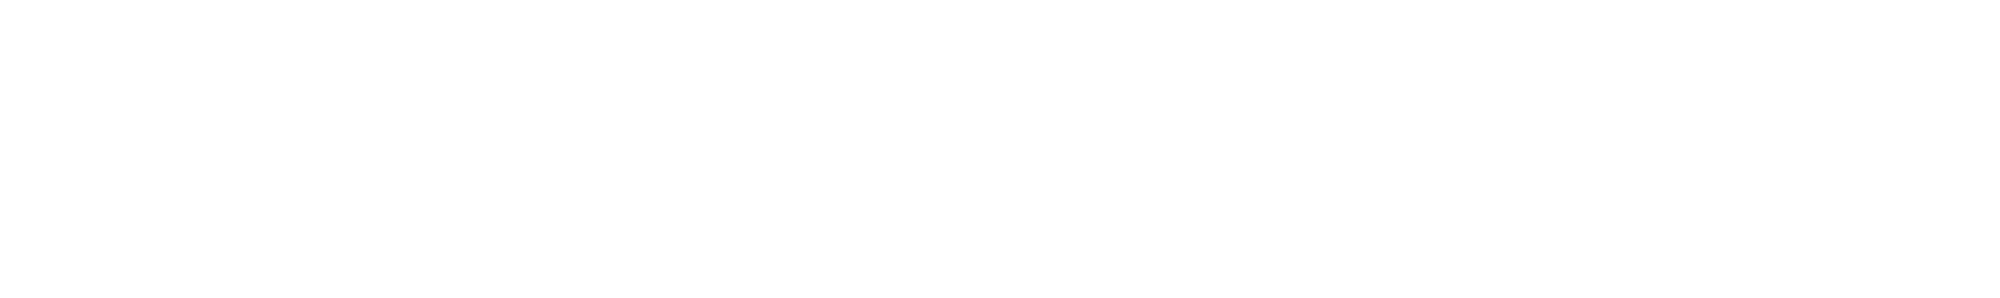 Barceloneta logo